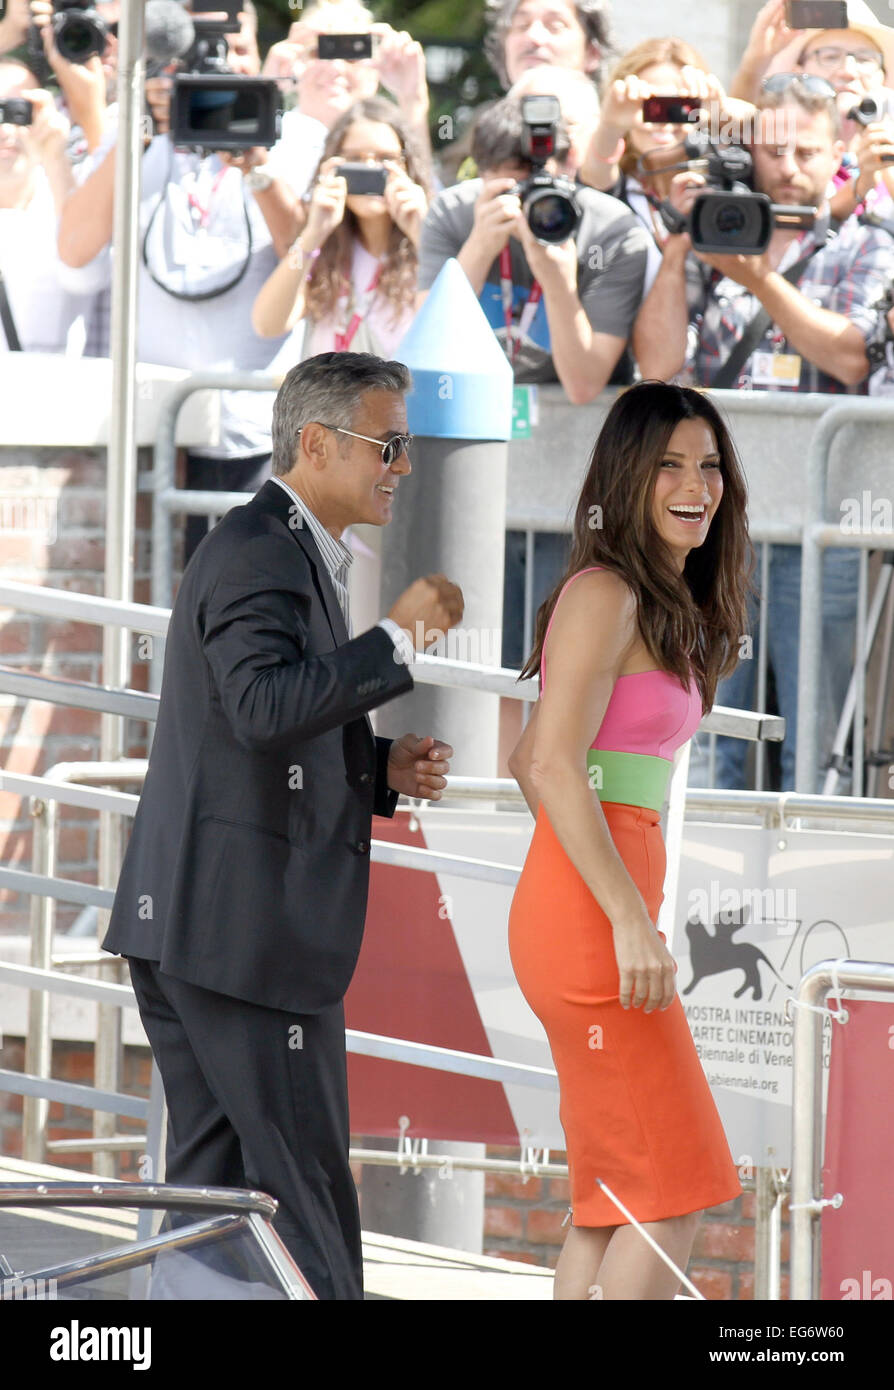 Italien, Venedig: Schauspielerin Sandra Bullock und Schauspieler George Clooney am Lido di Venezia Stockbild